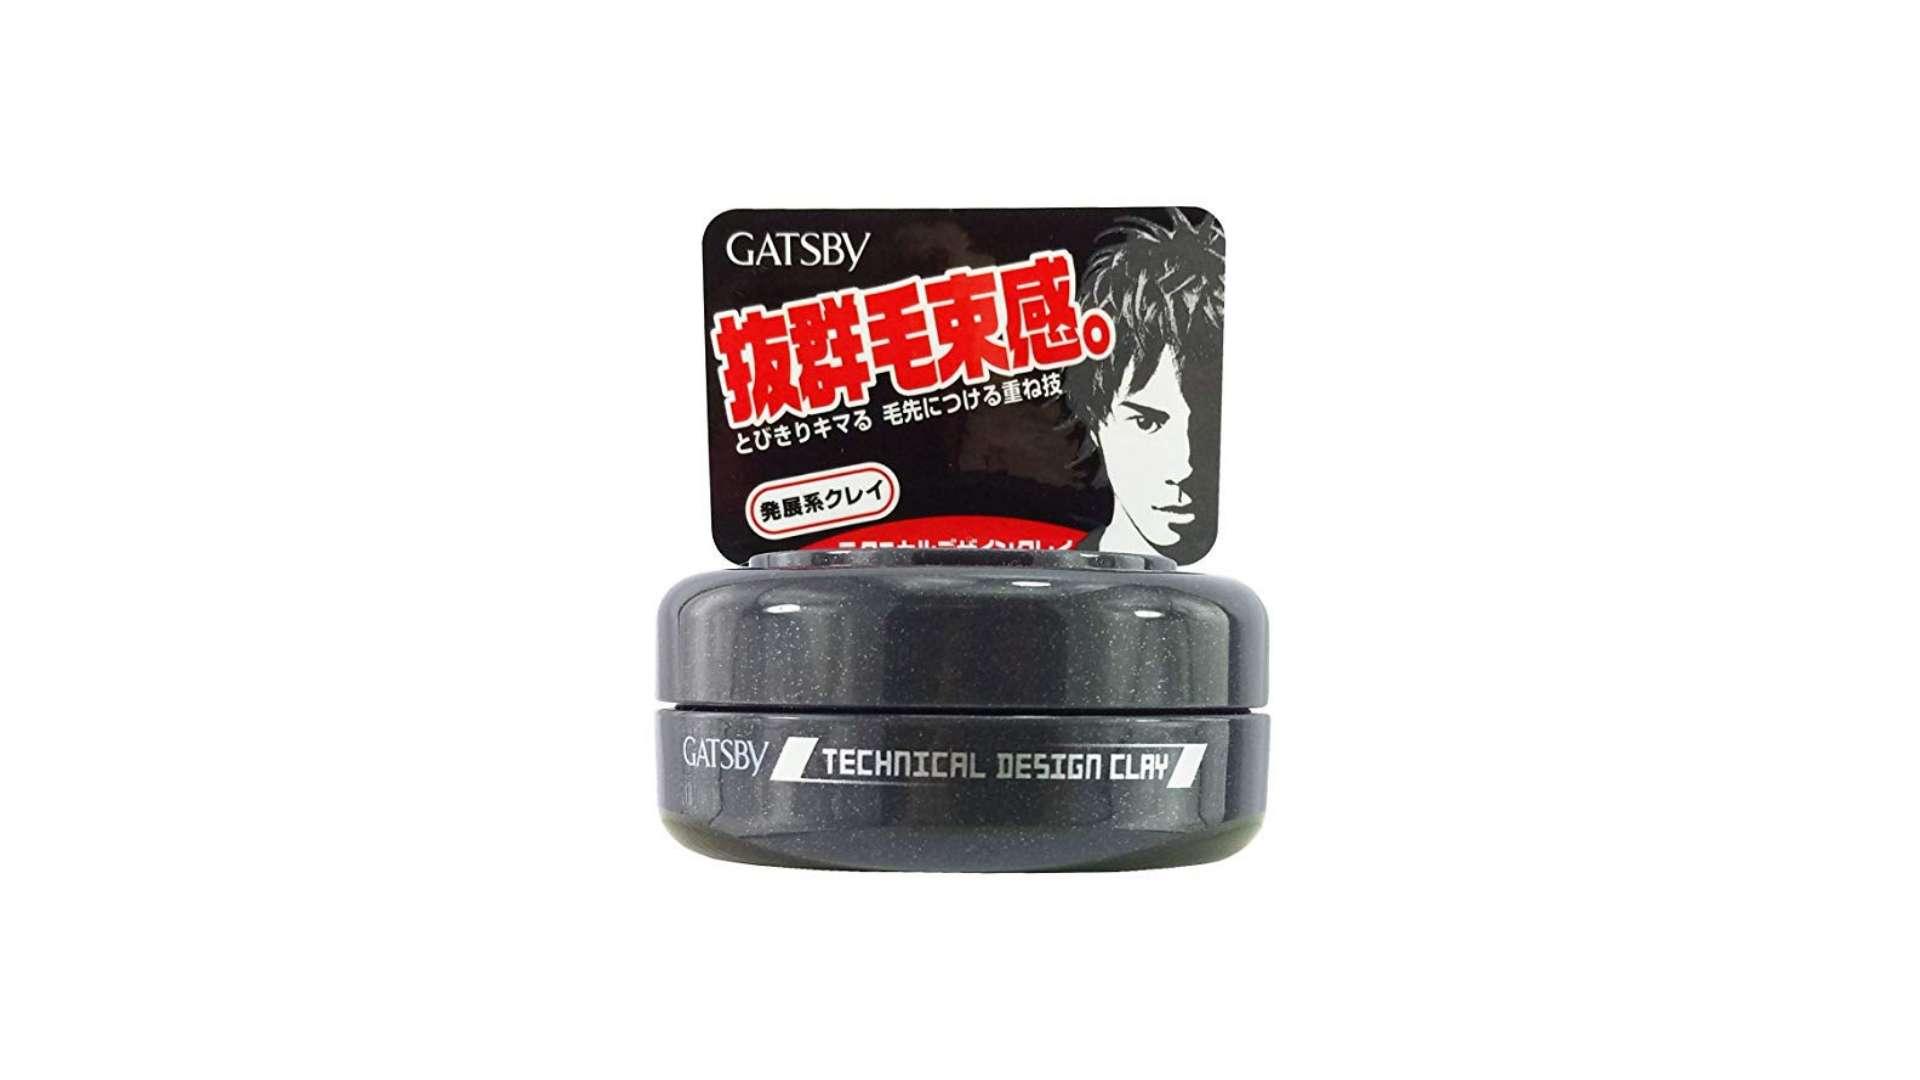 Best Hair Clay For Men - Gatsby Technical Design